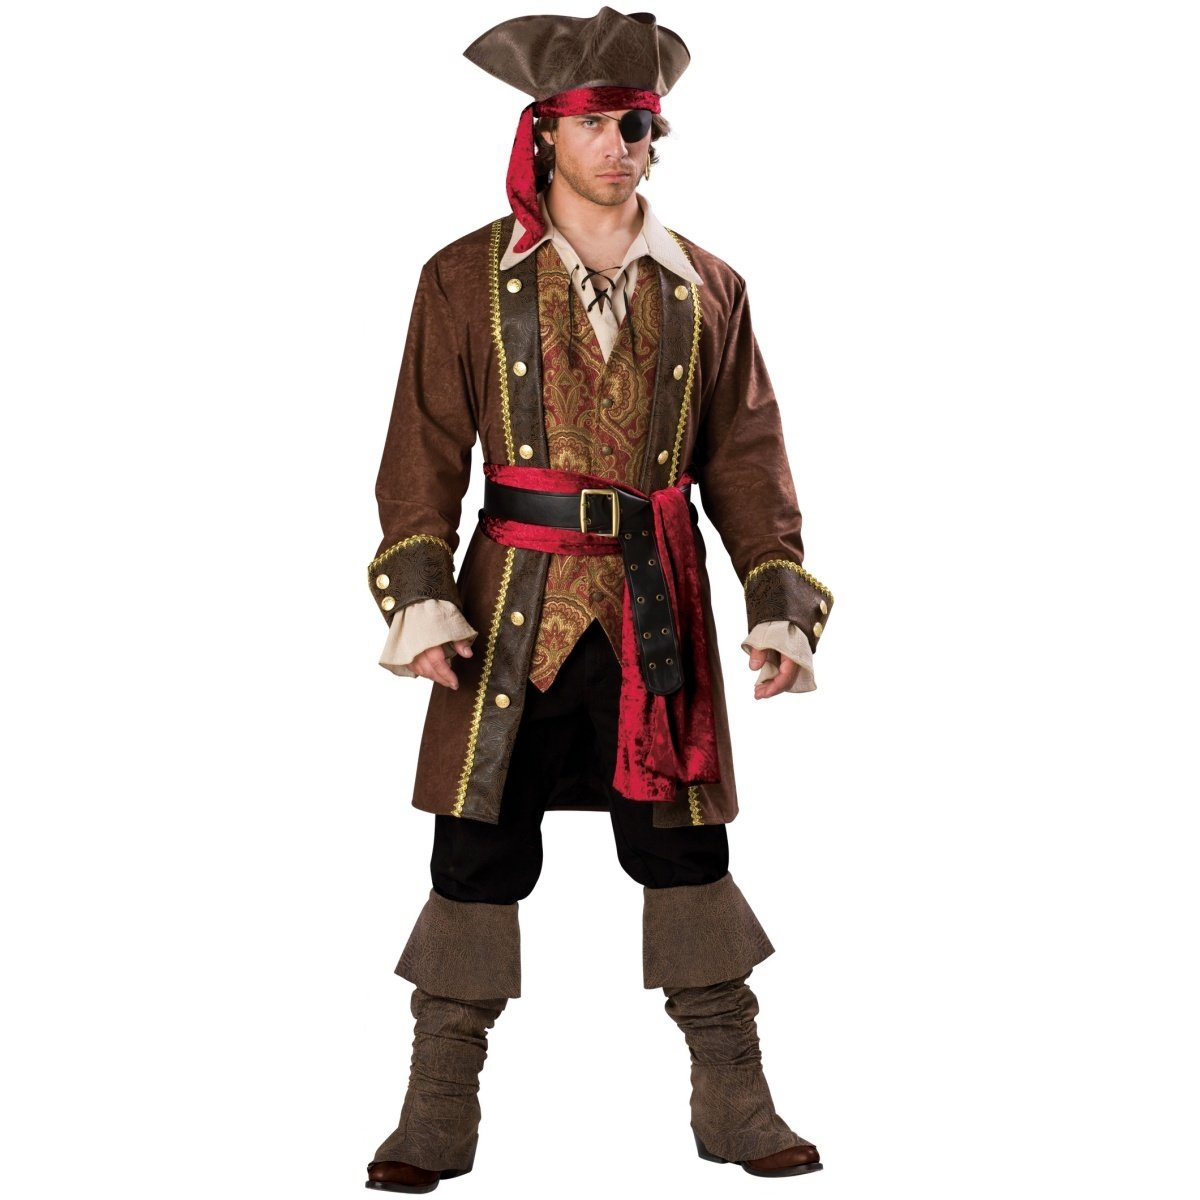 InCharacter Costumes Men's Captain Skullduggery Pirate Costume, Brown, X-Large